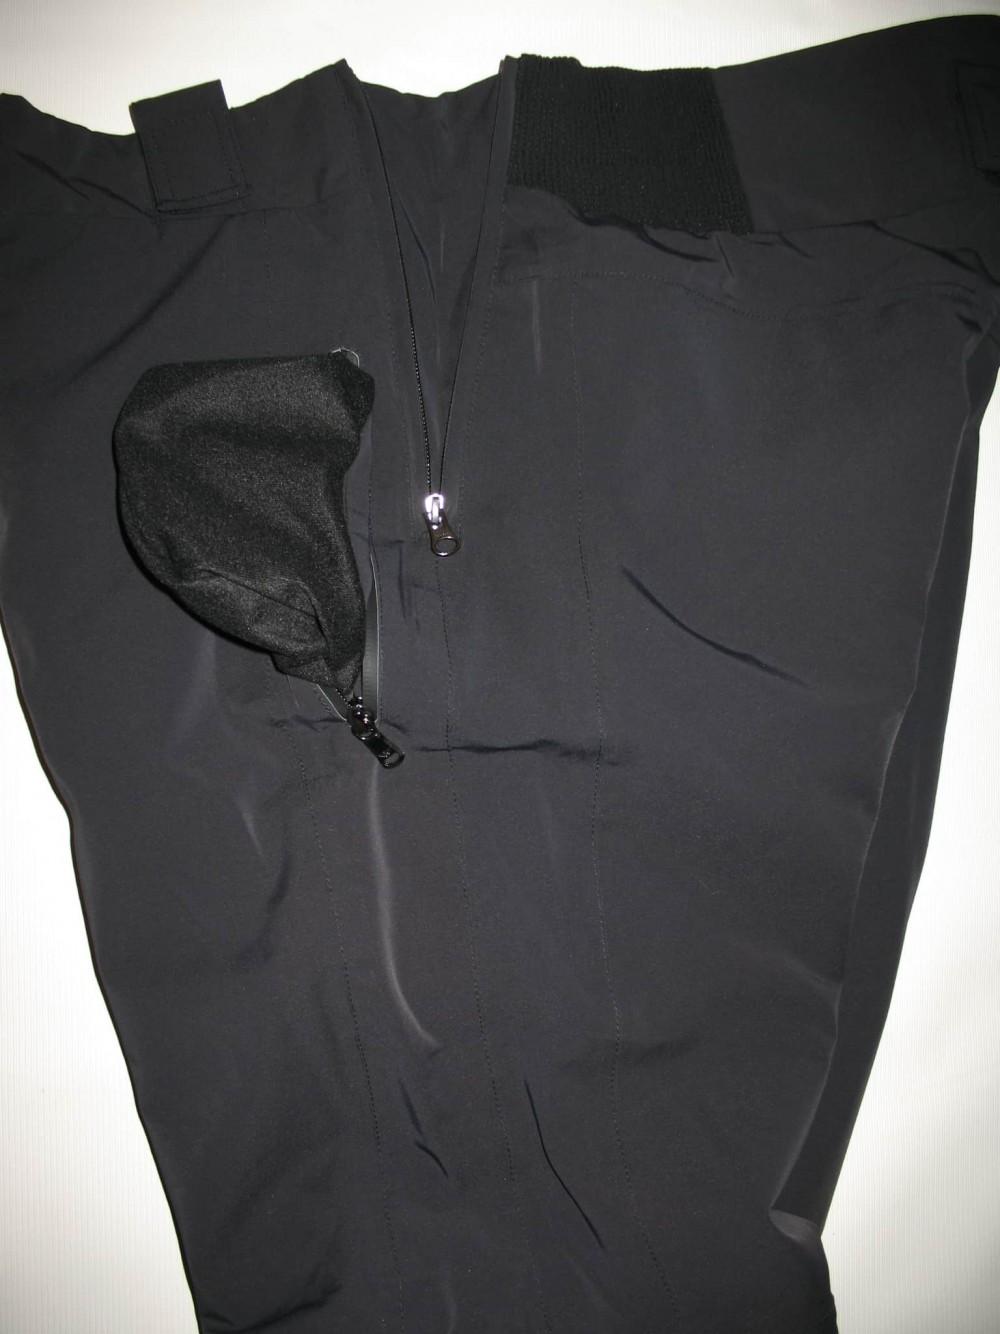 Штаны EA7 emporio armani ski bib pants ( размер XL) - 9